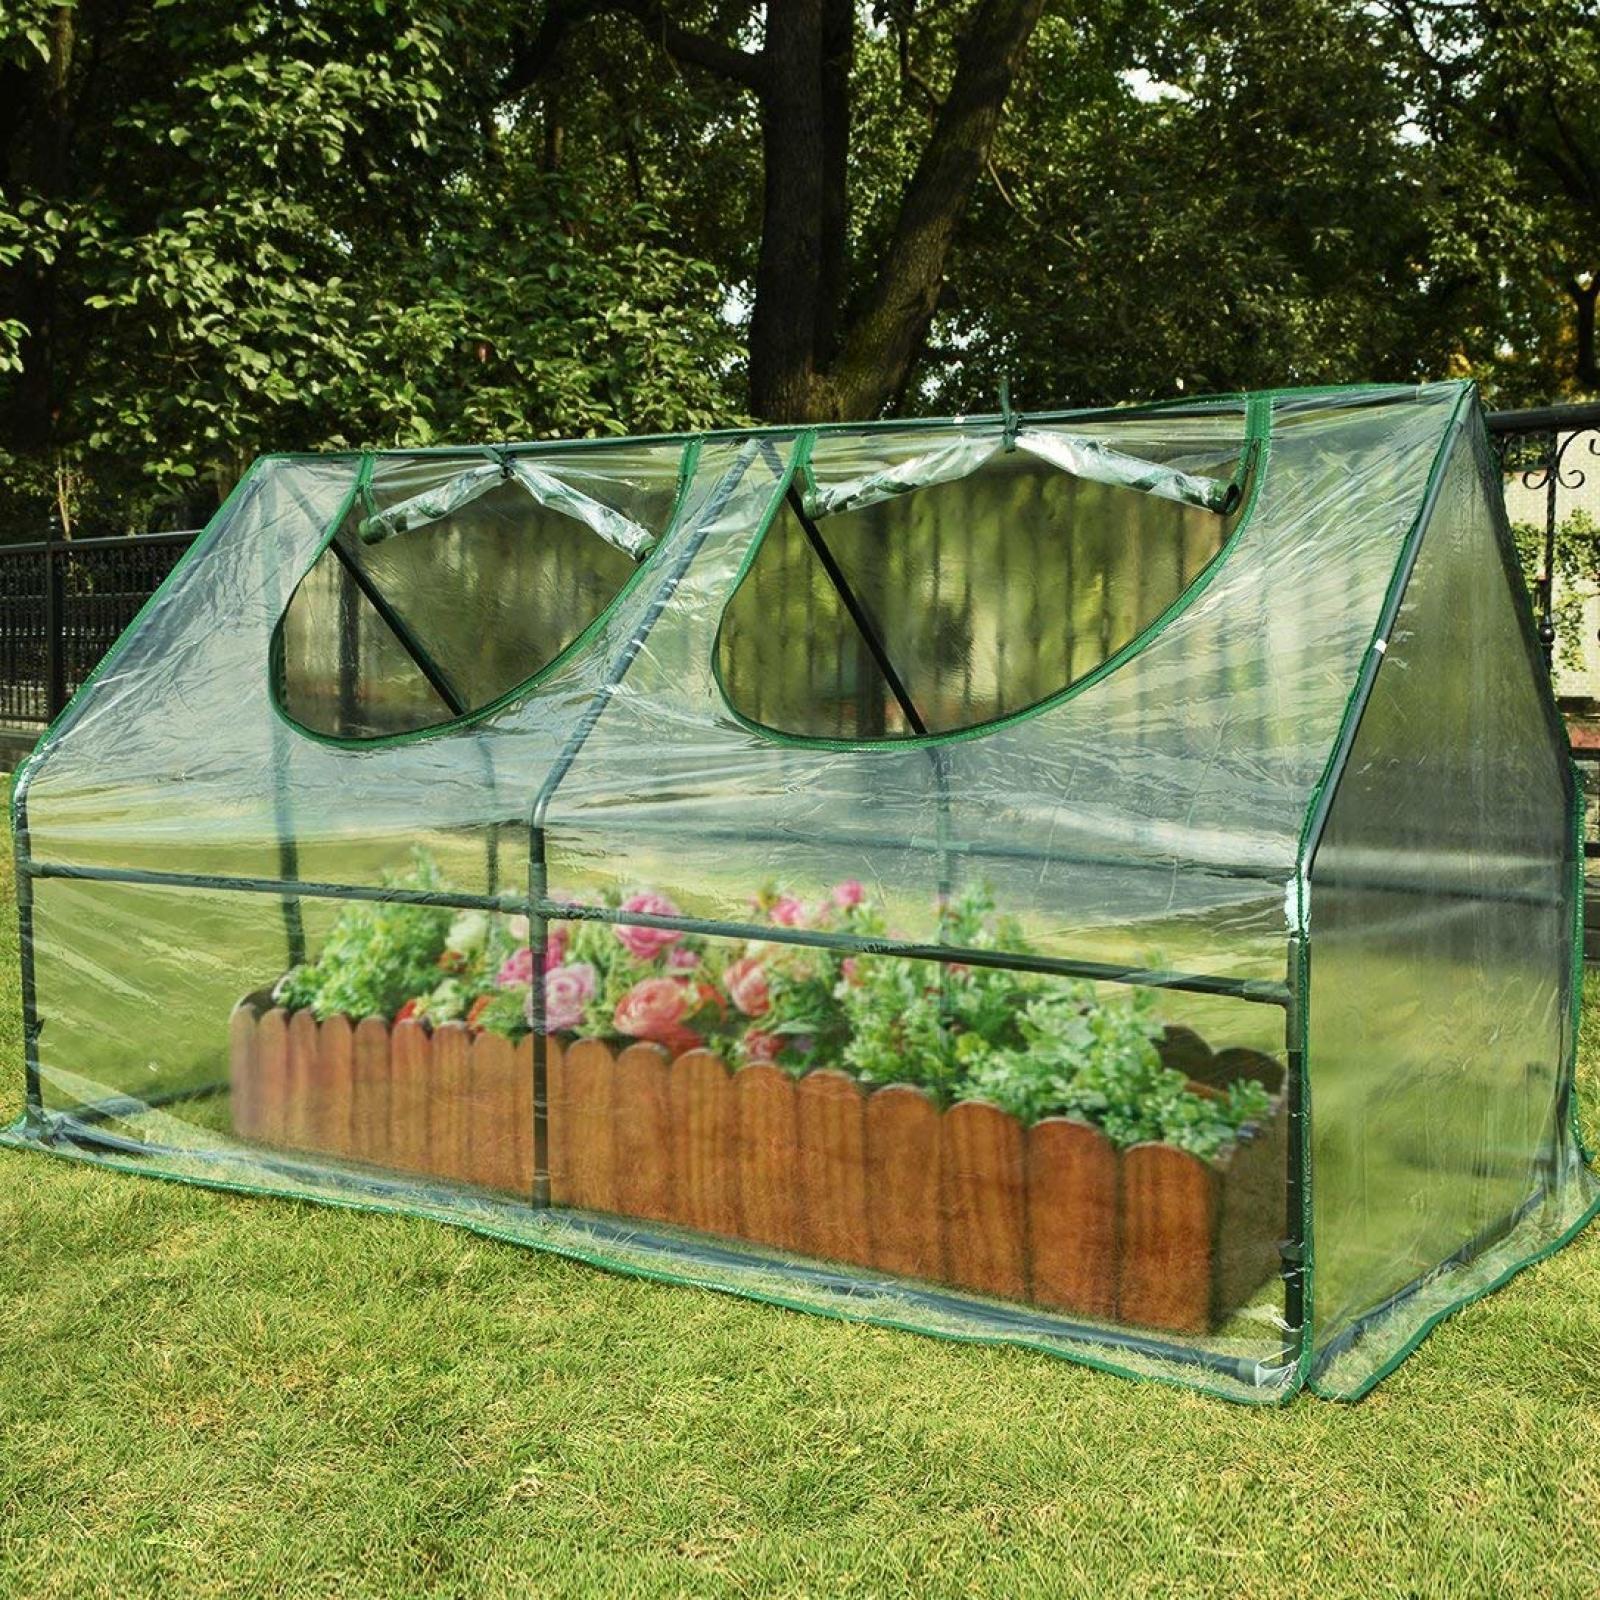 Astonishing Details About Quictent Mini Green House Small Greenhouse Plastic Pvc Backyard Tent Kit Garden Interior Design Ideas Philsoteloinfo